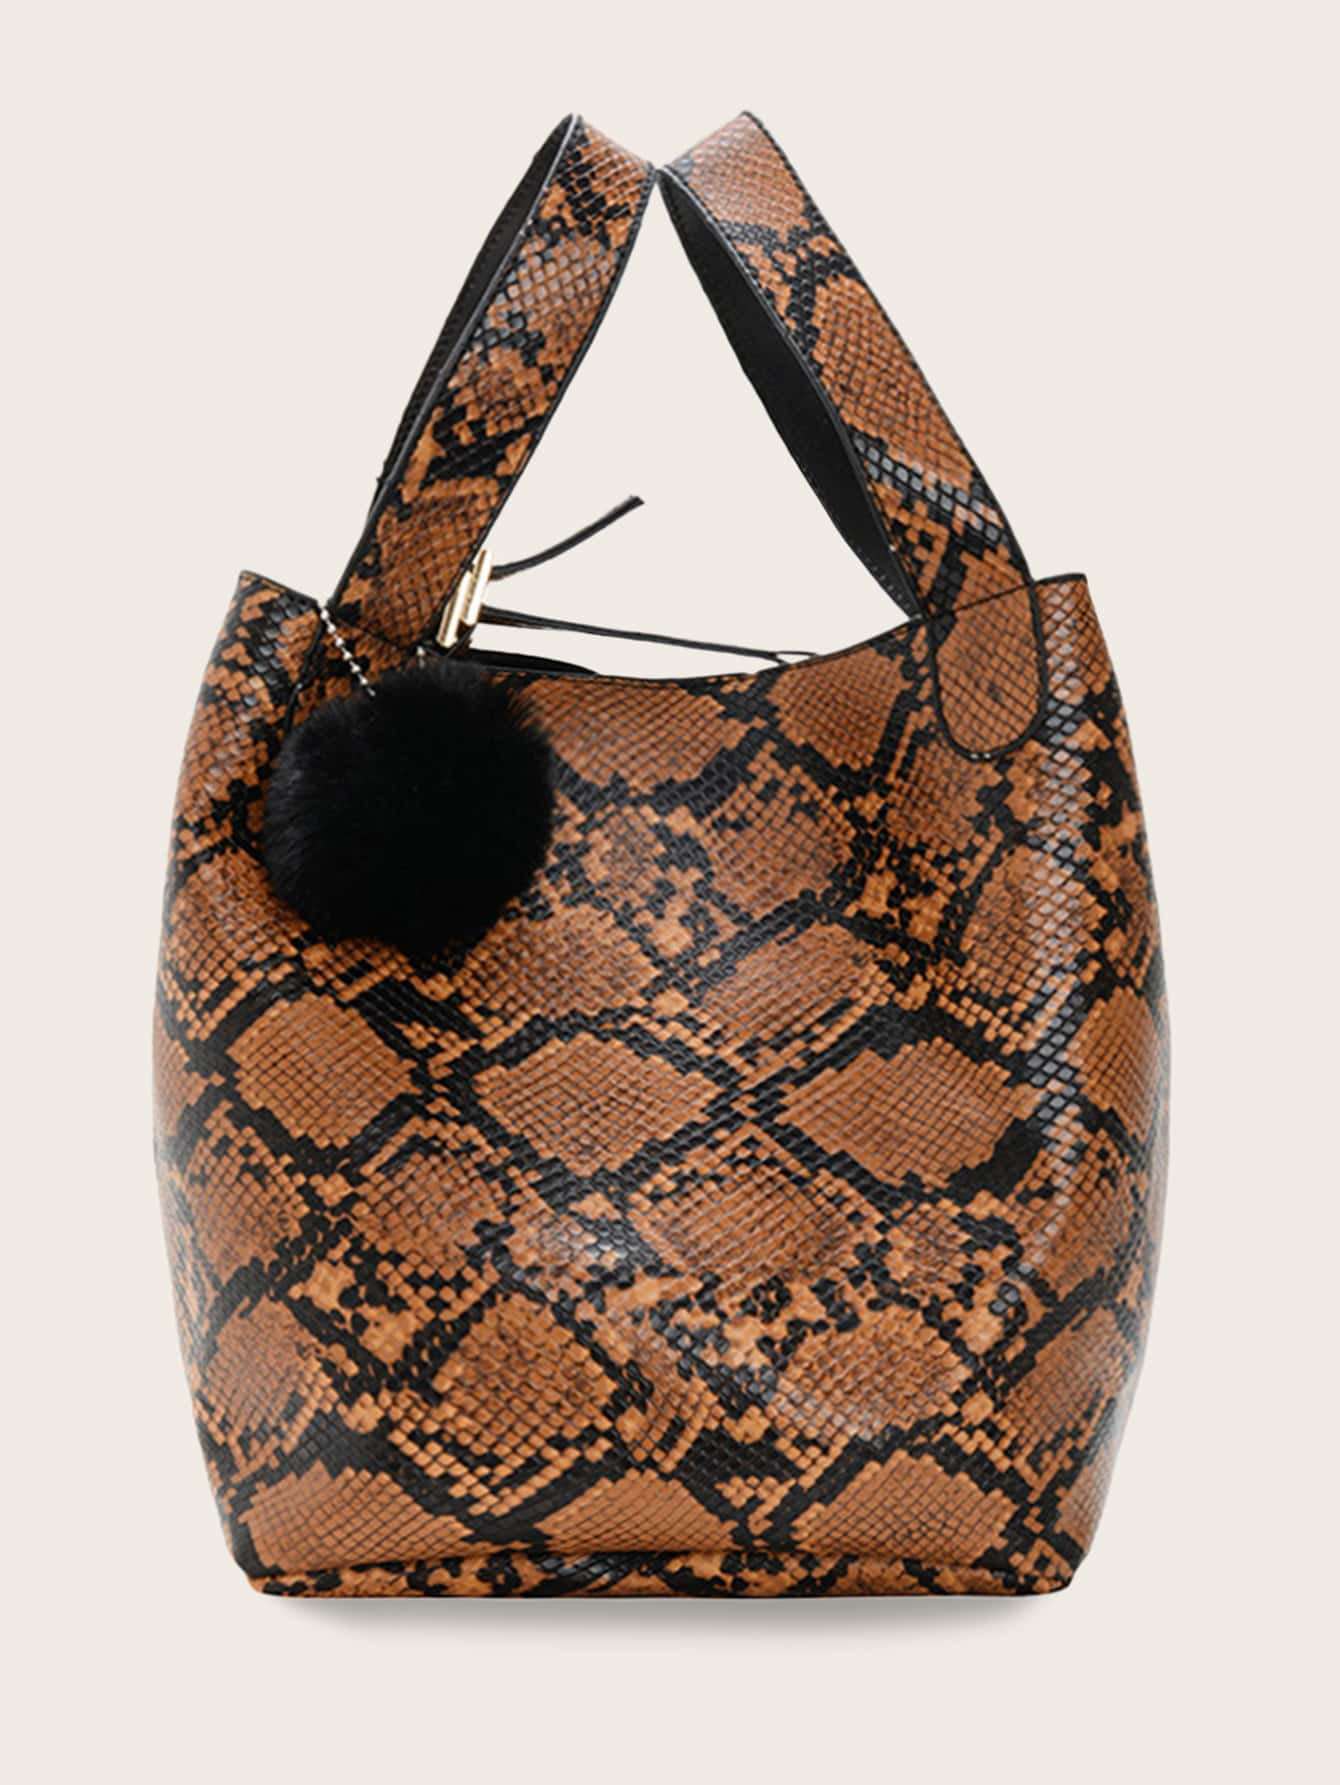 Змеиная сумка-тоут с помпоном